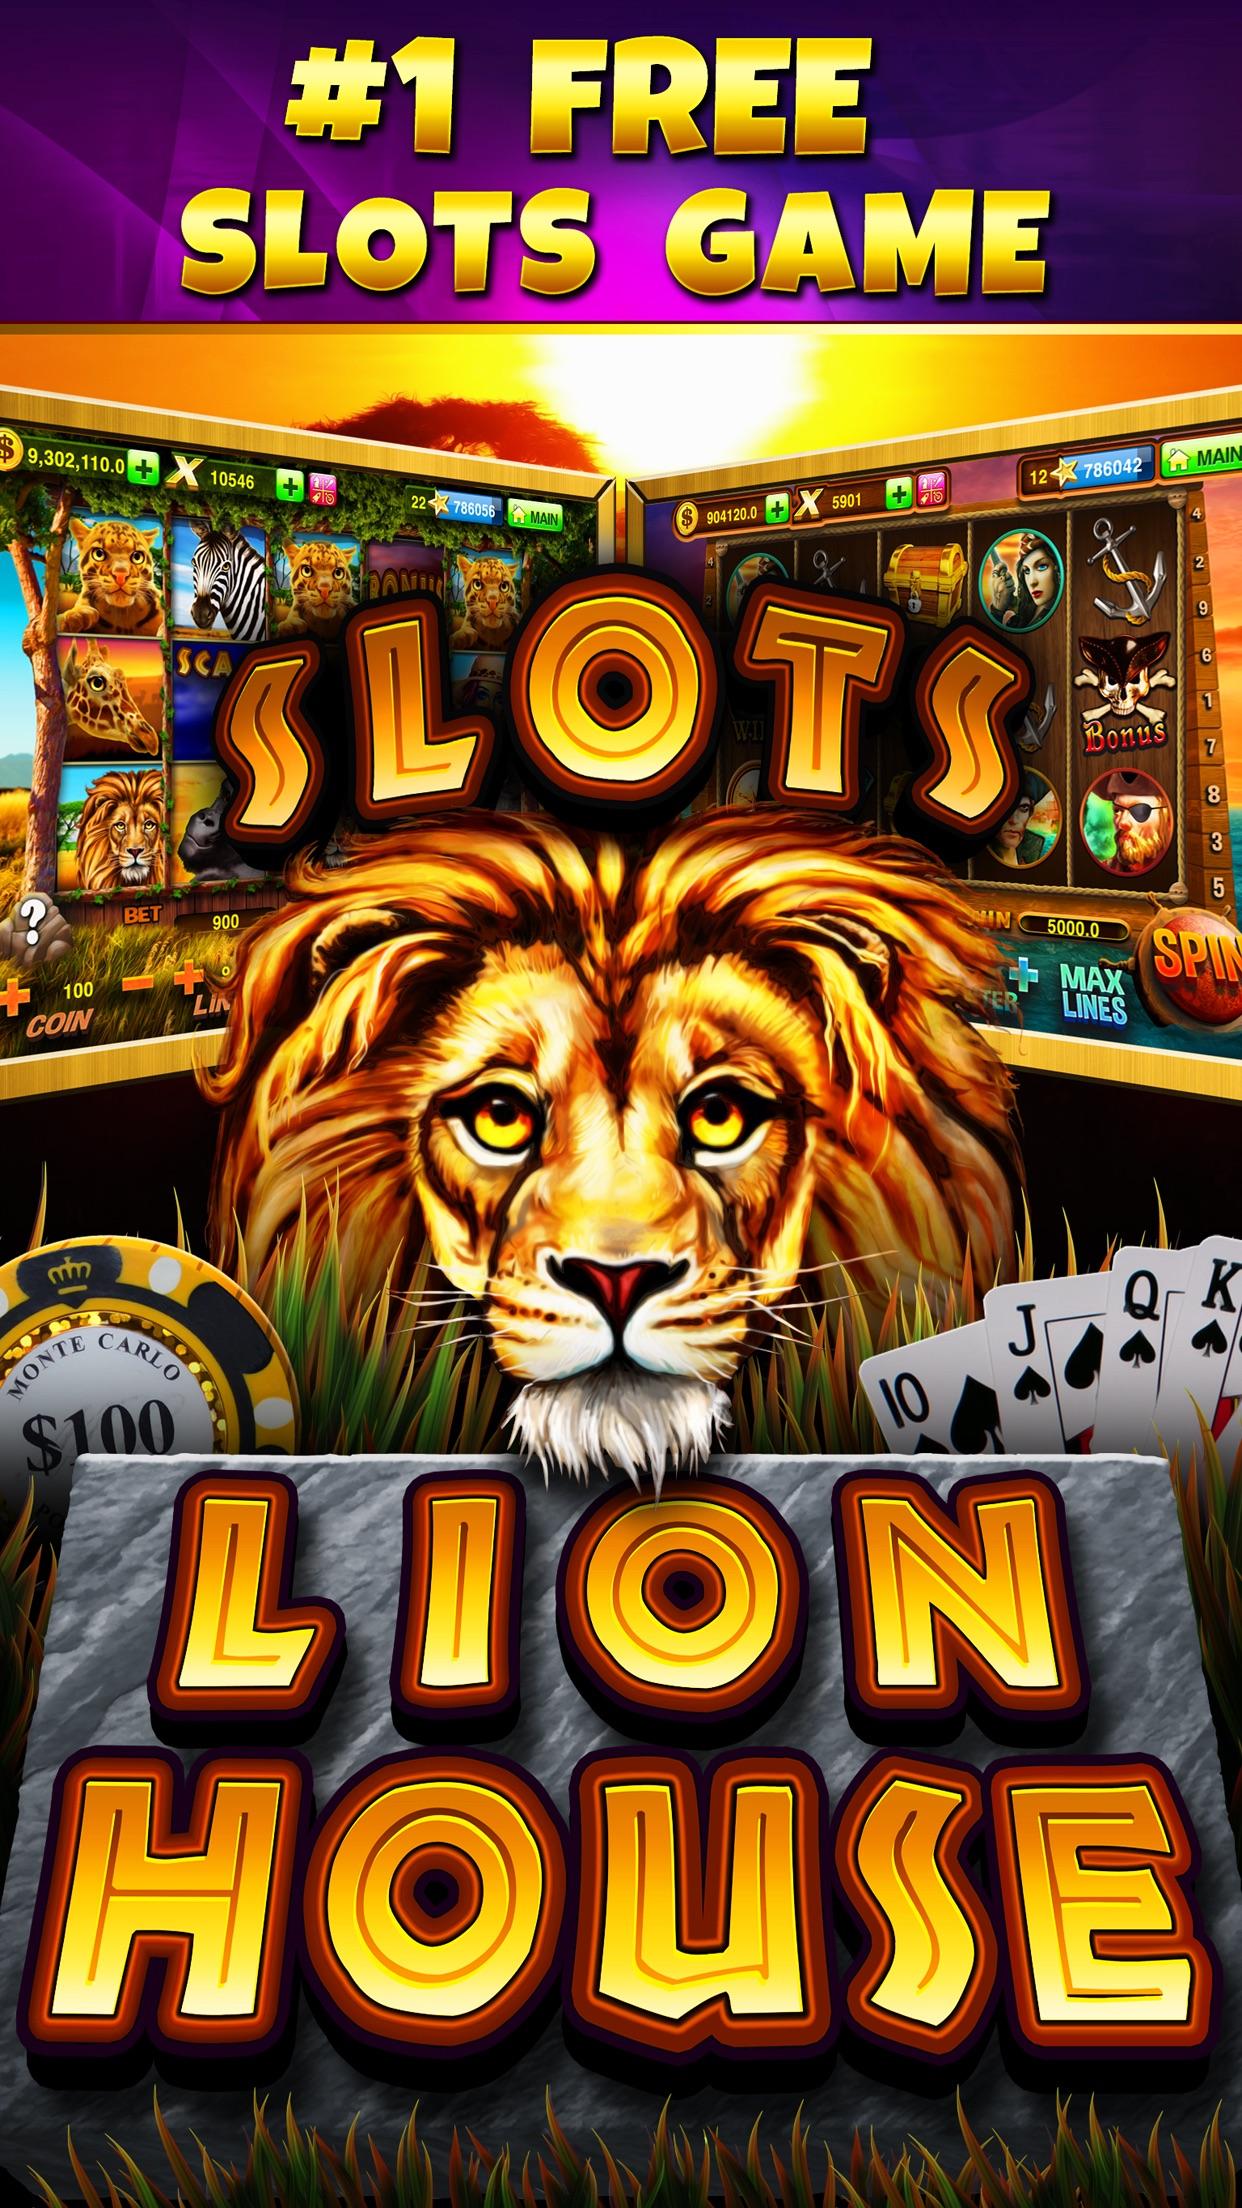 Lion House Casino Slots - All New, Grand Las Vegas Slot Machine Games in the Mega Millions Palace! Screenshot